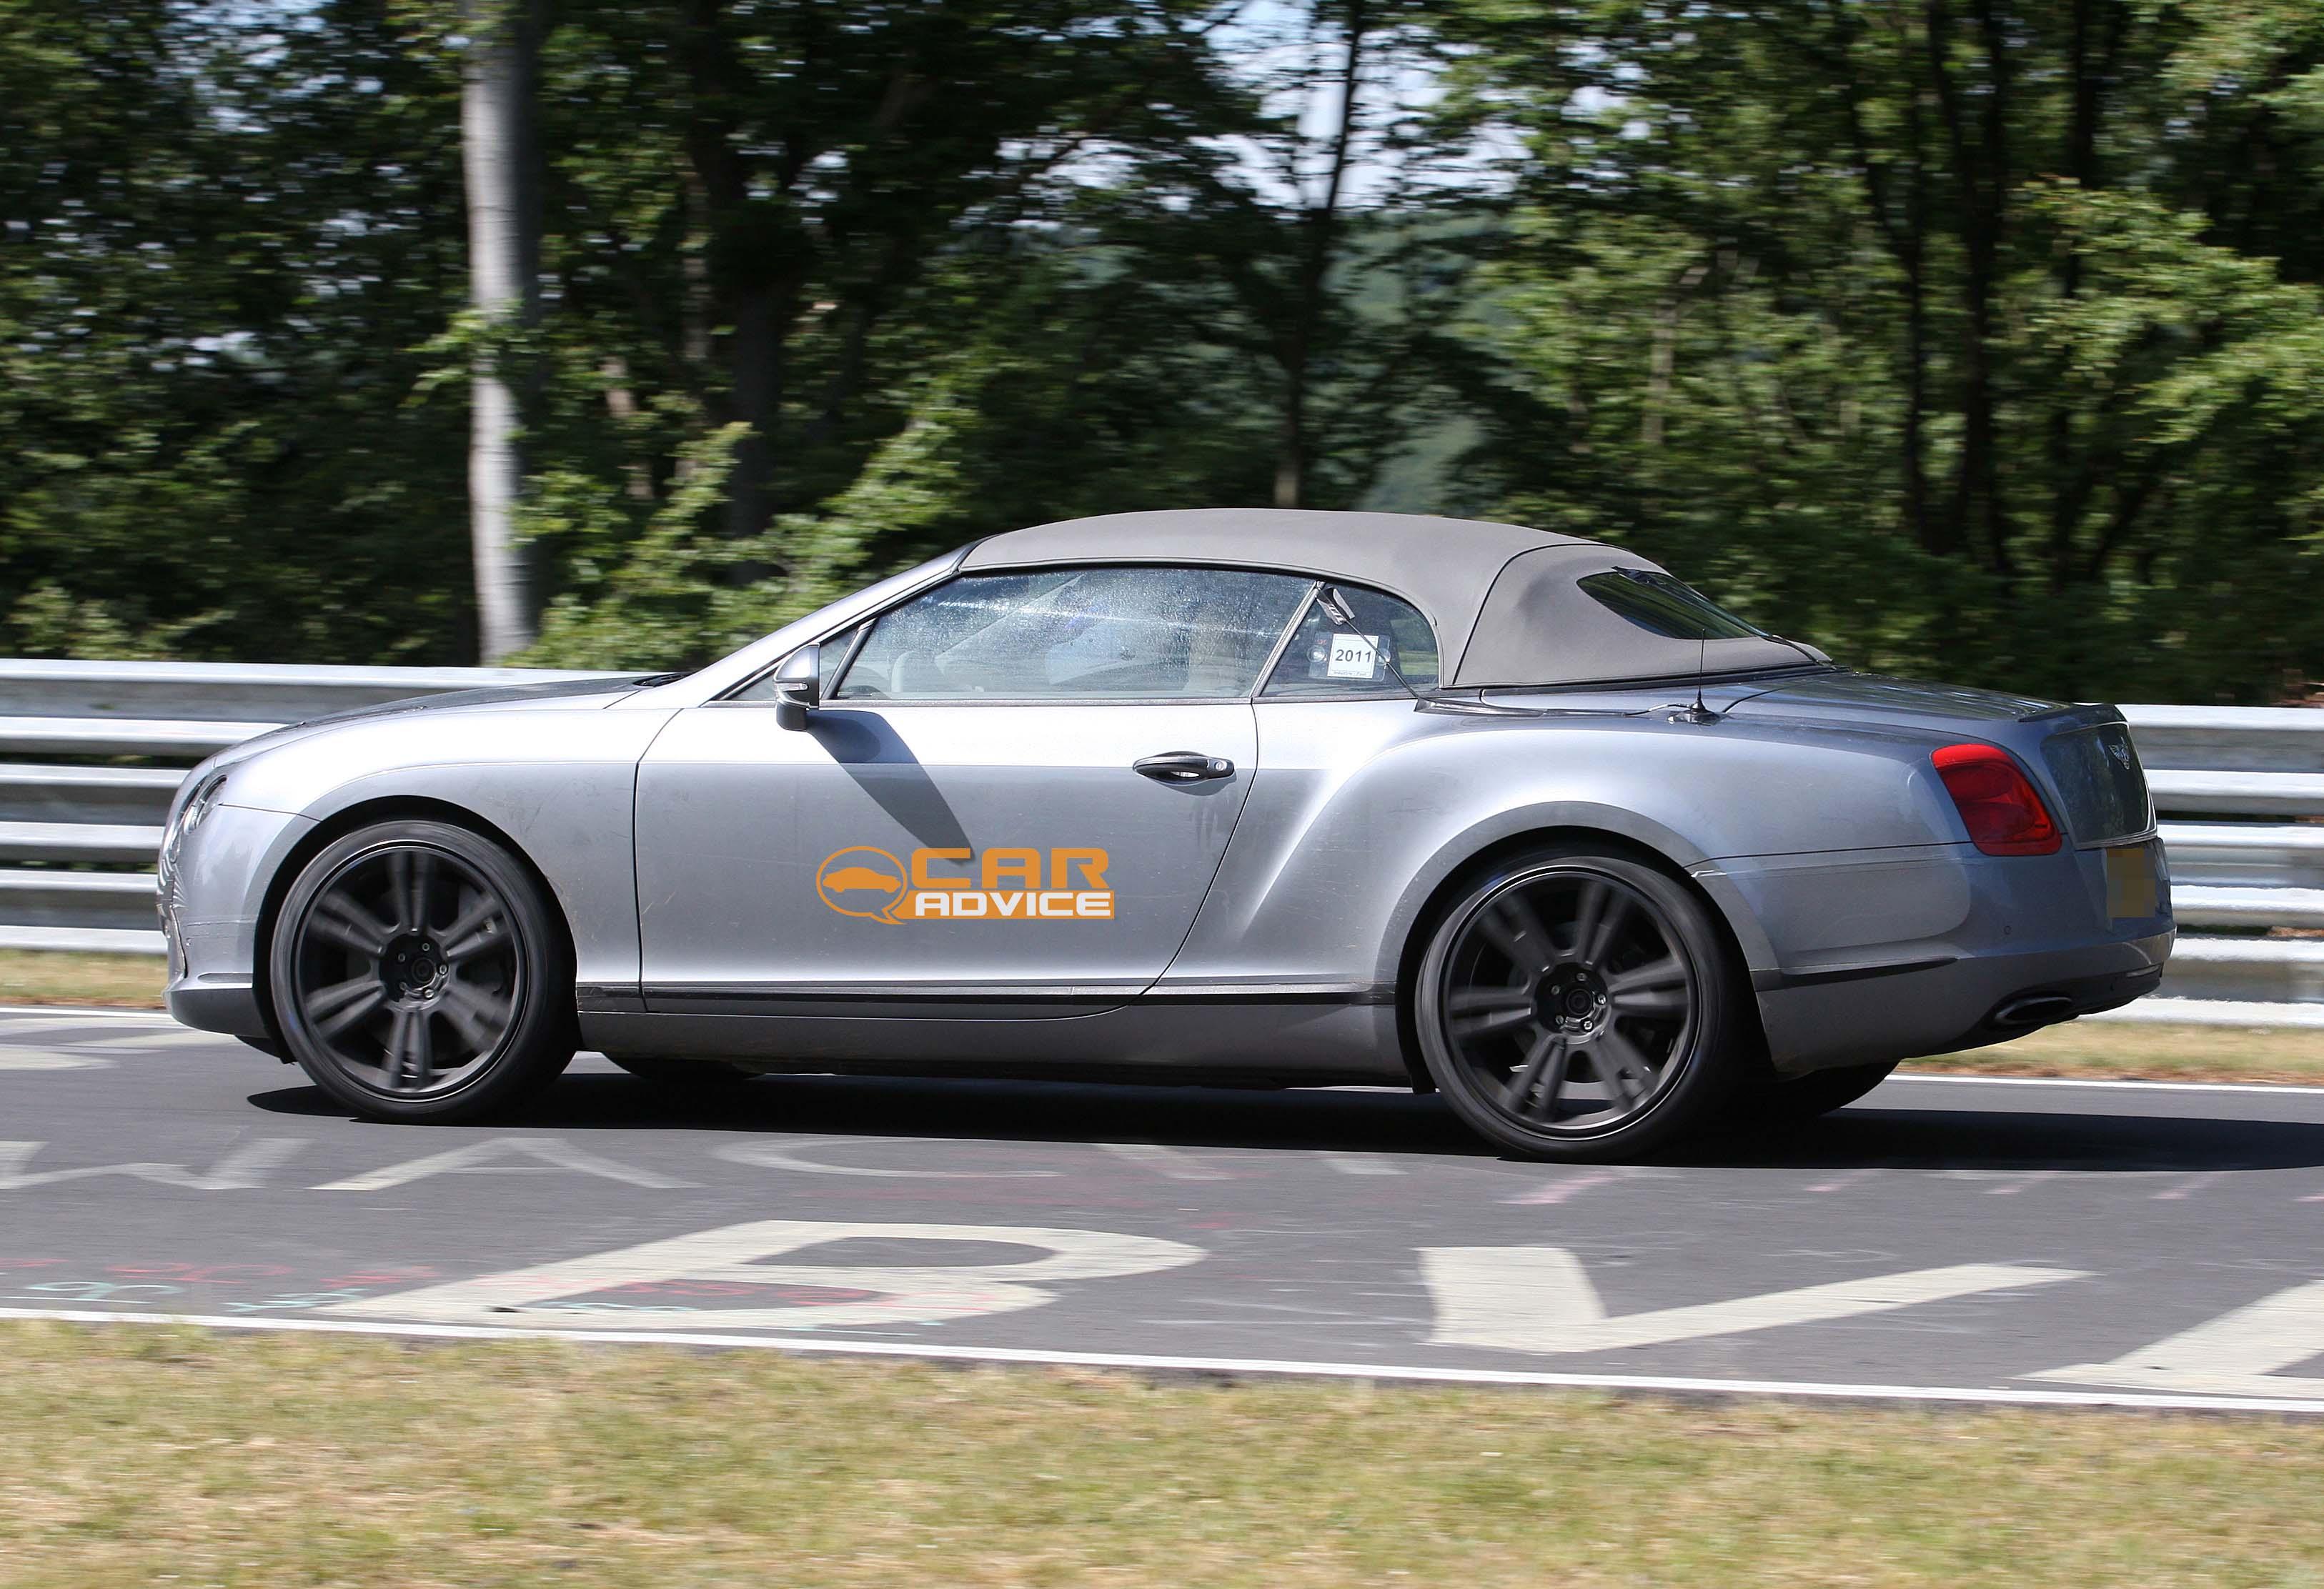 2012 bentley continental gtc spy shots at nurburgring photos 1 of 5. Black Bedroom Furniture Sets. Home Design Ideas